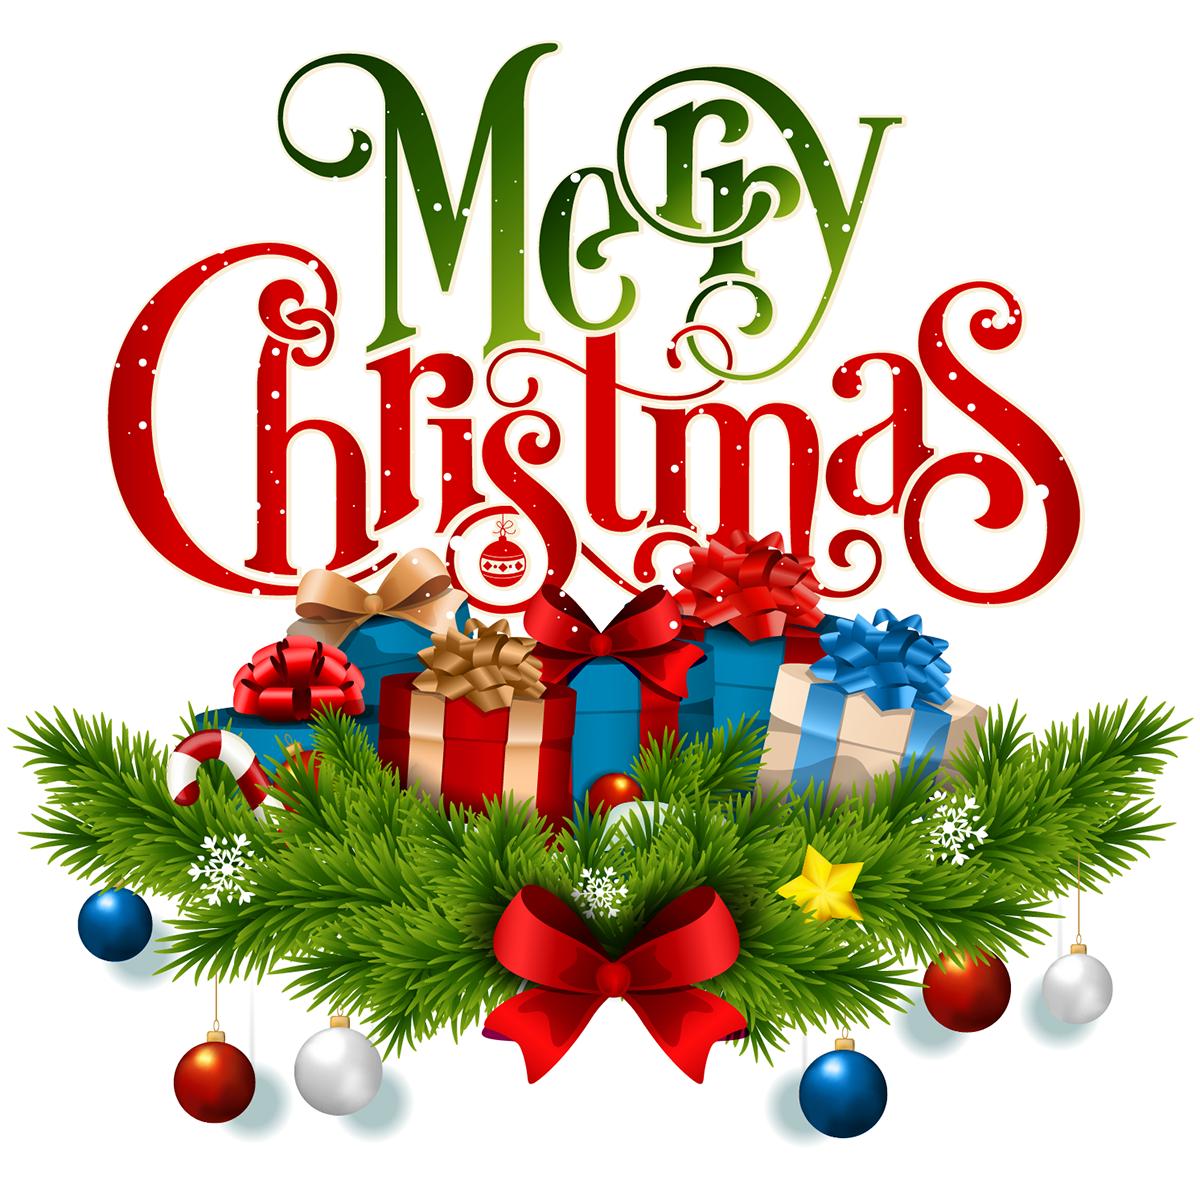 Christmas and holiday season Clip art.